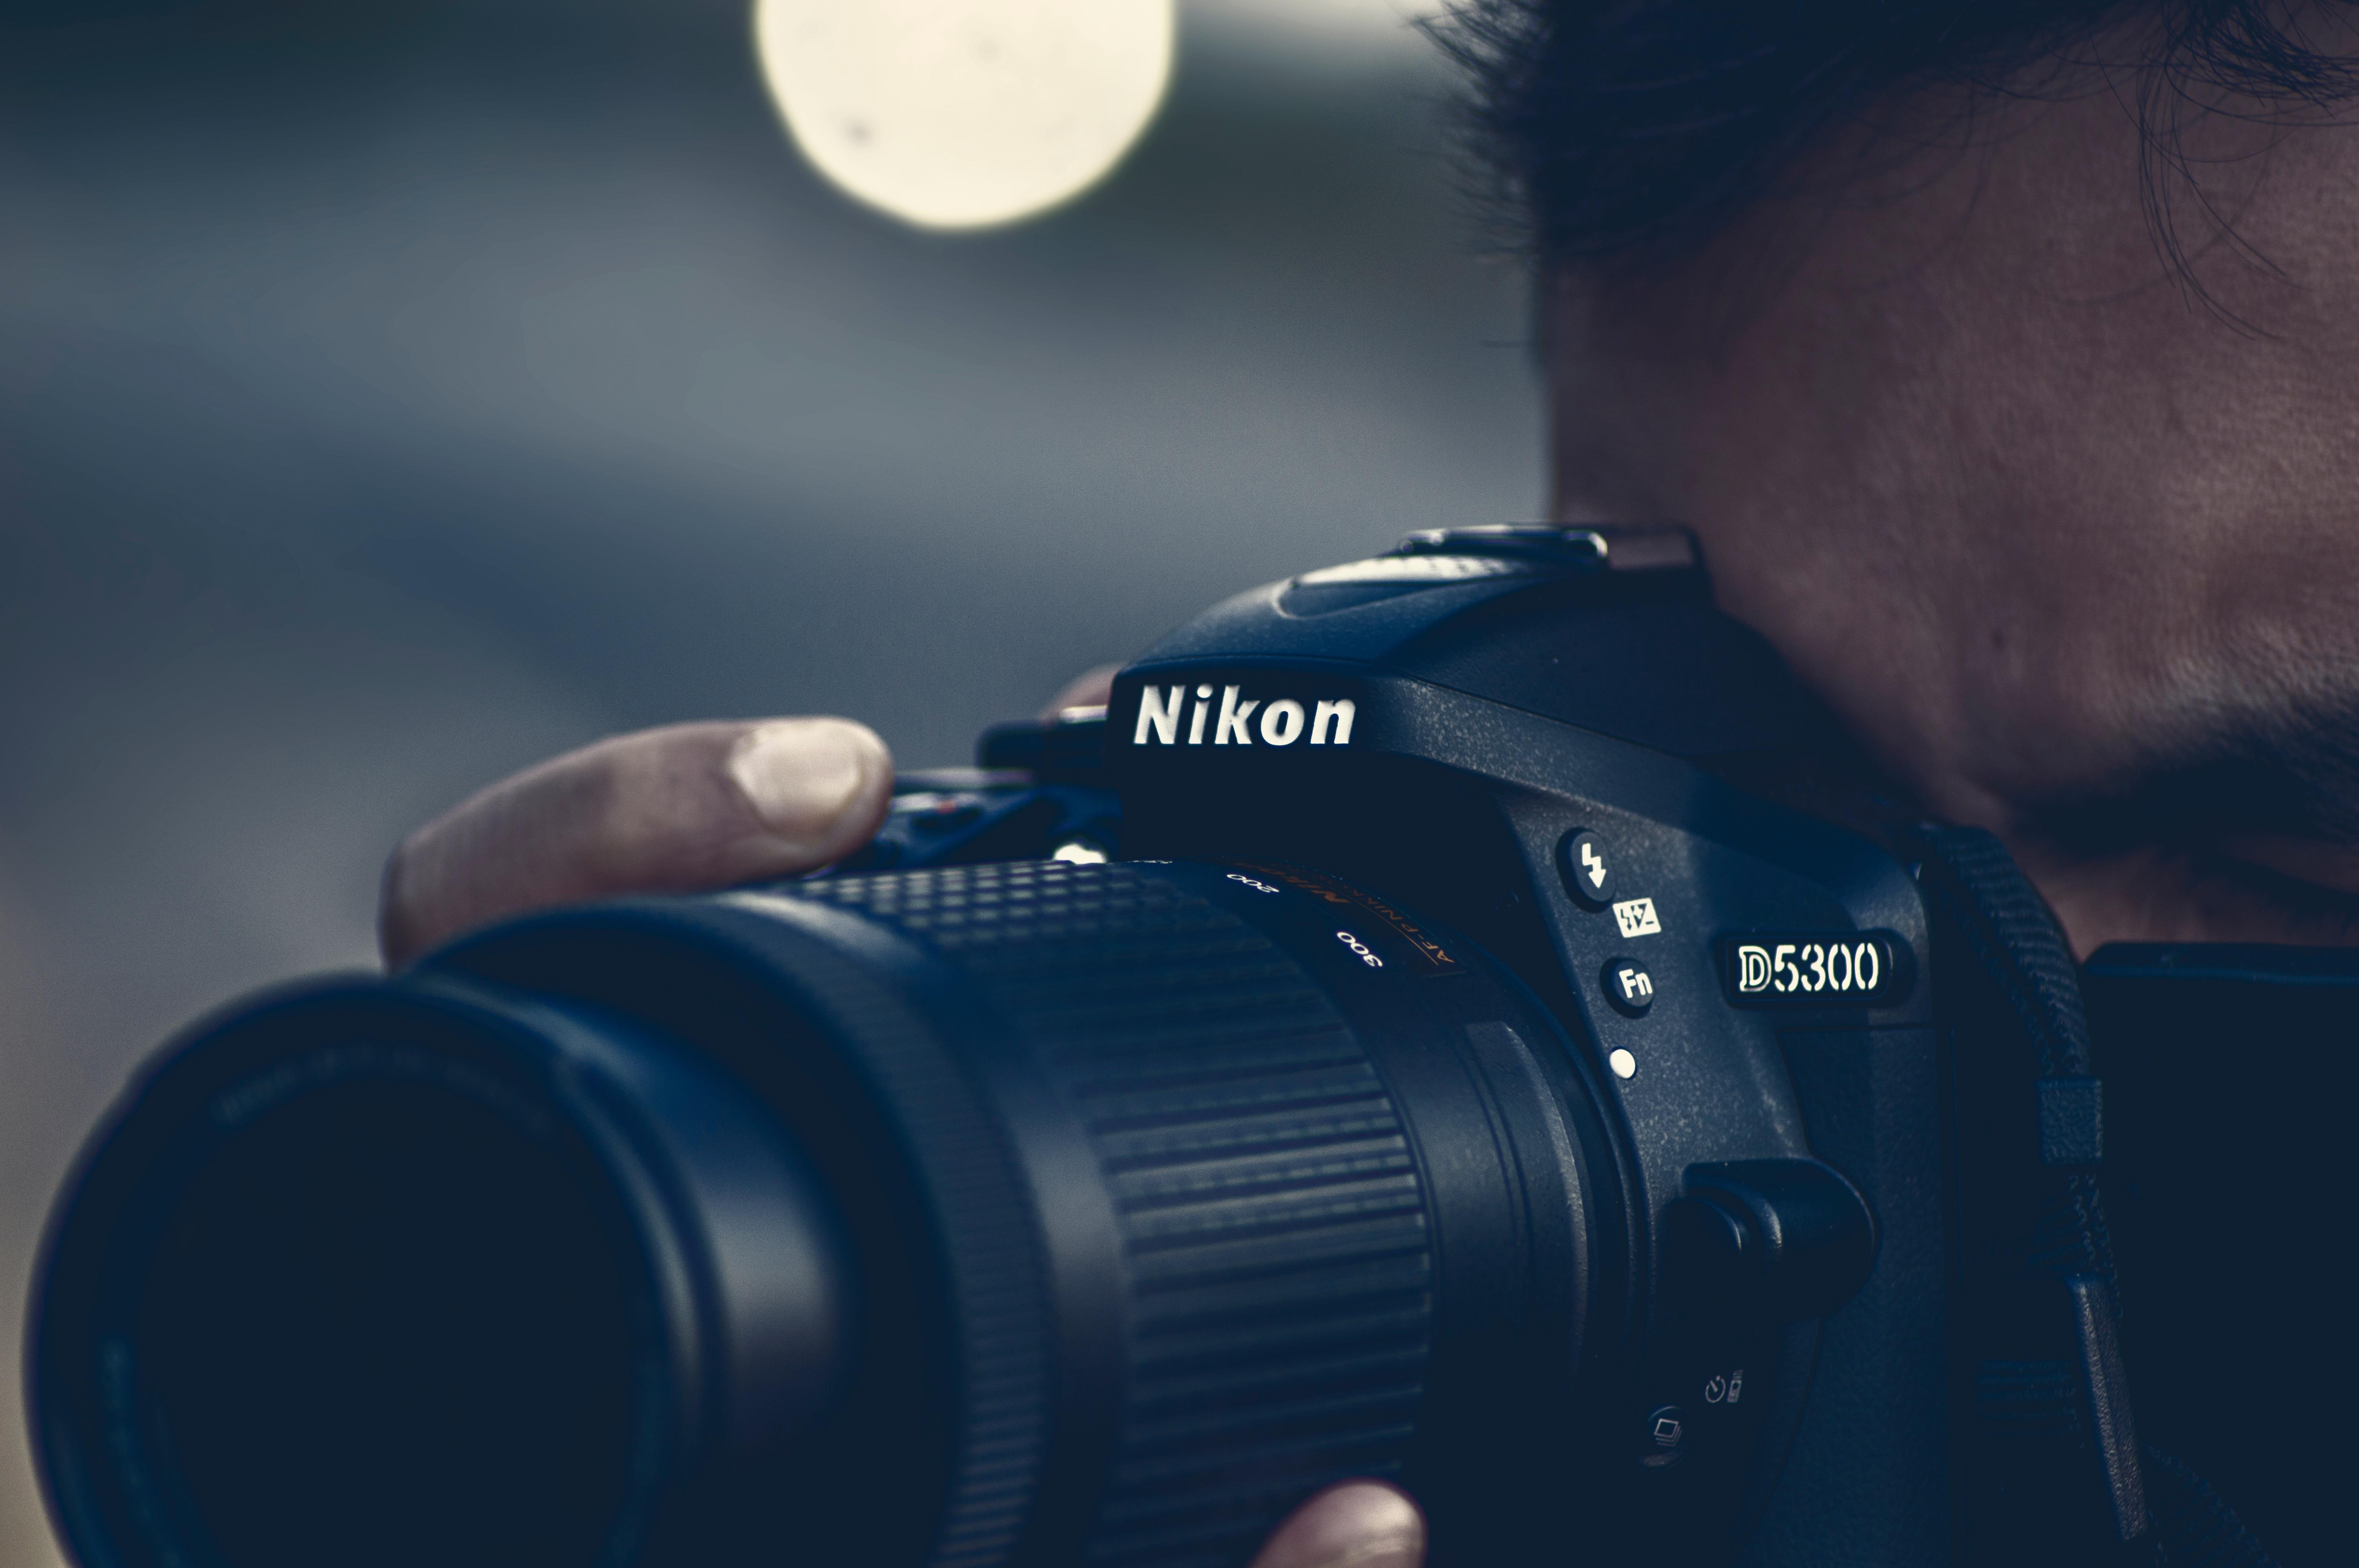 Fotos gratis : ligero, fotografía, azul, de cerca, Cámara réflex ...